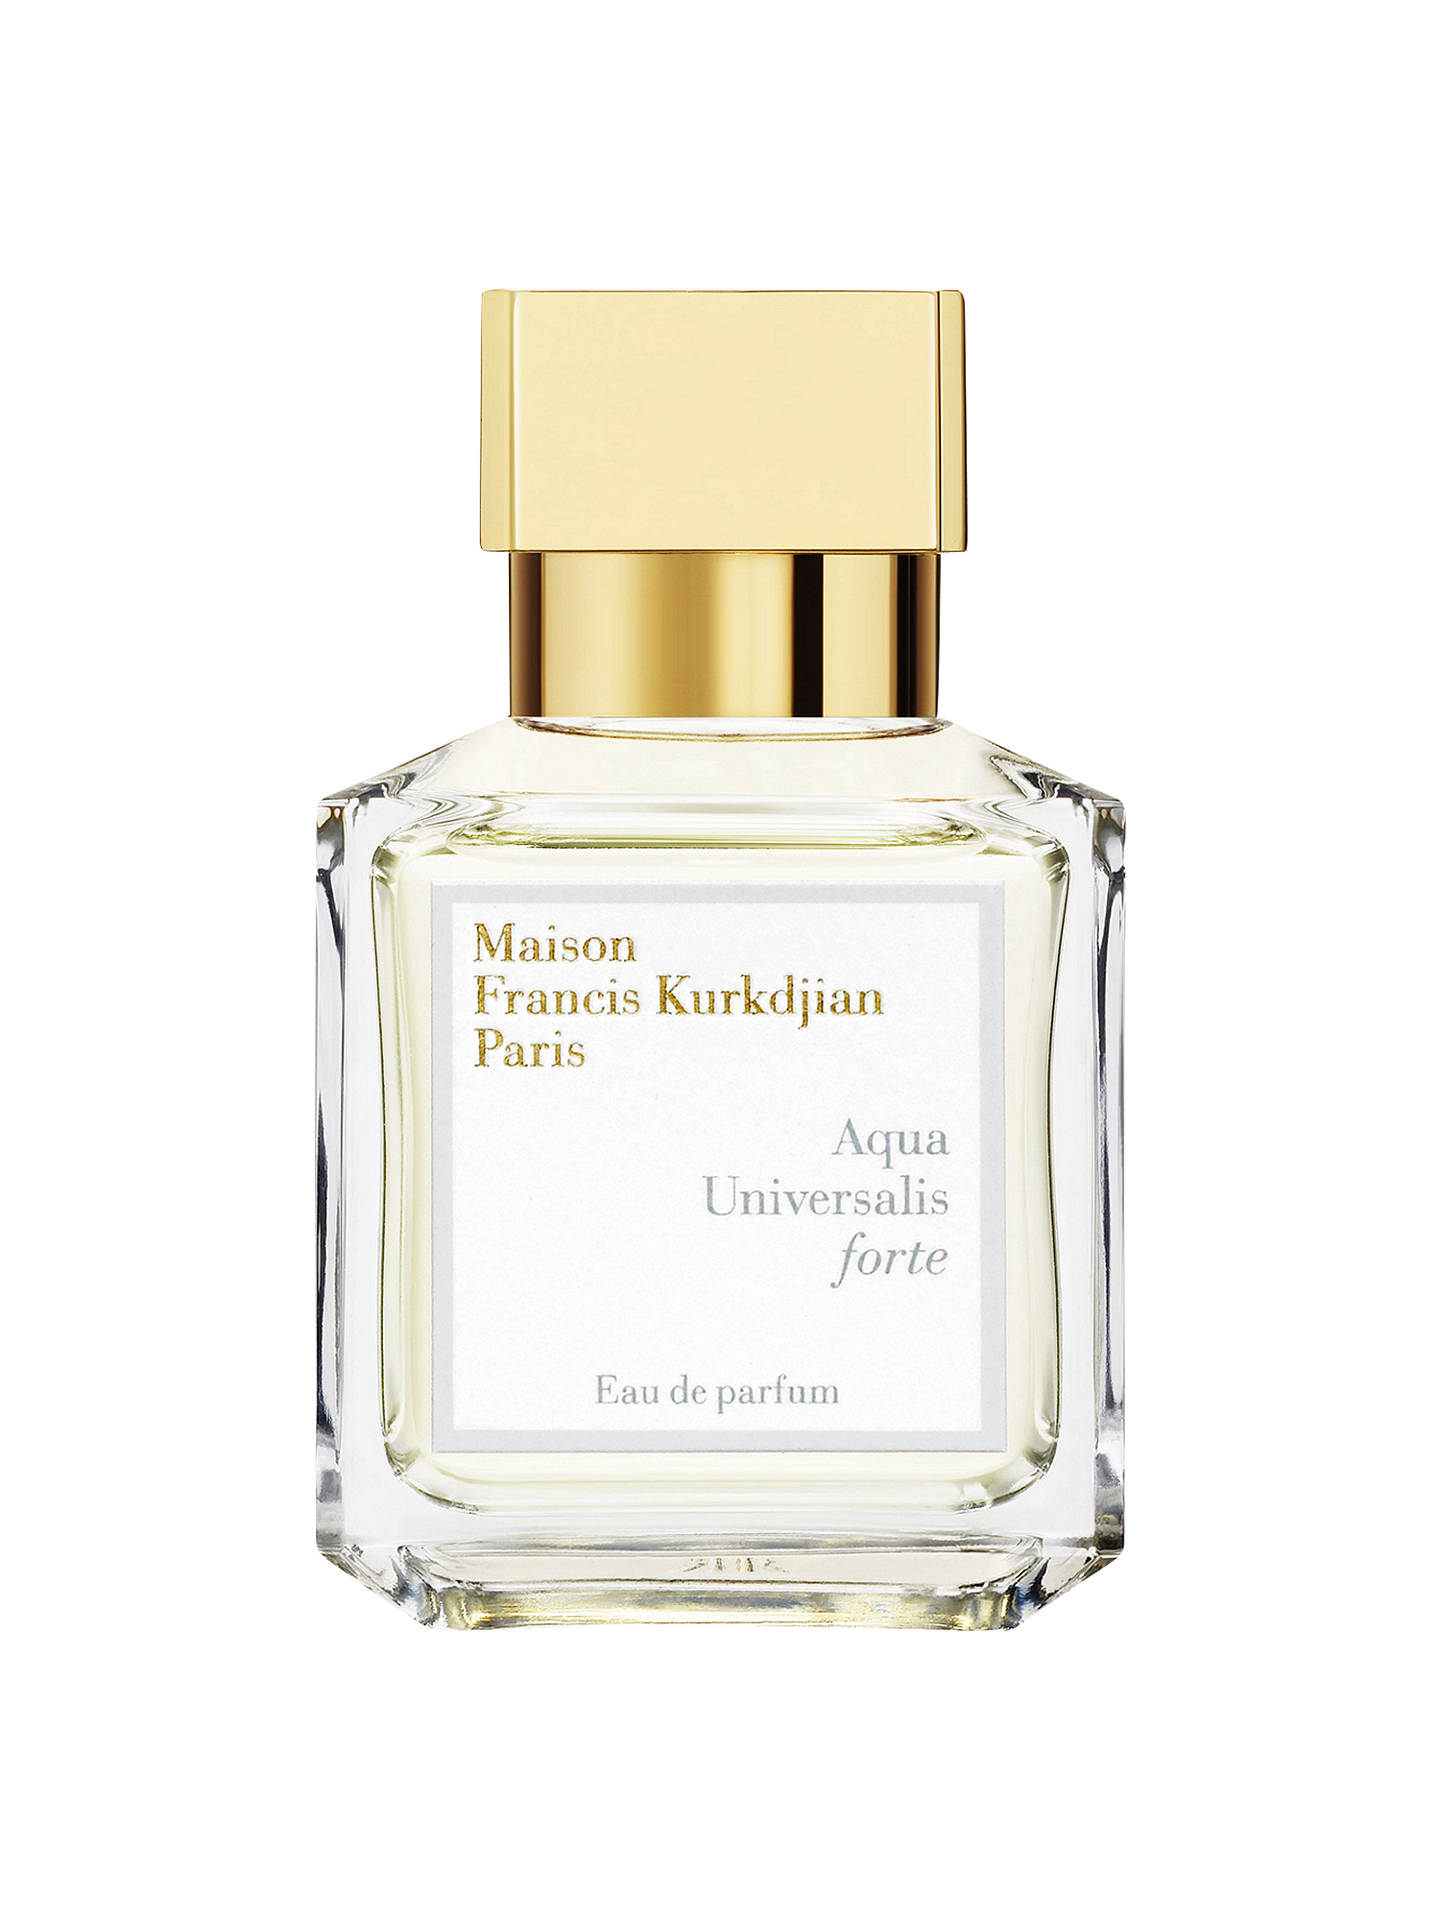 Maison Francis Kurkdjian Aqua Universalis Forte Eau de Parfum, 70ml at John  Lewis & Partners